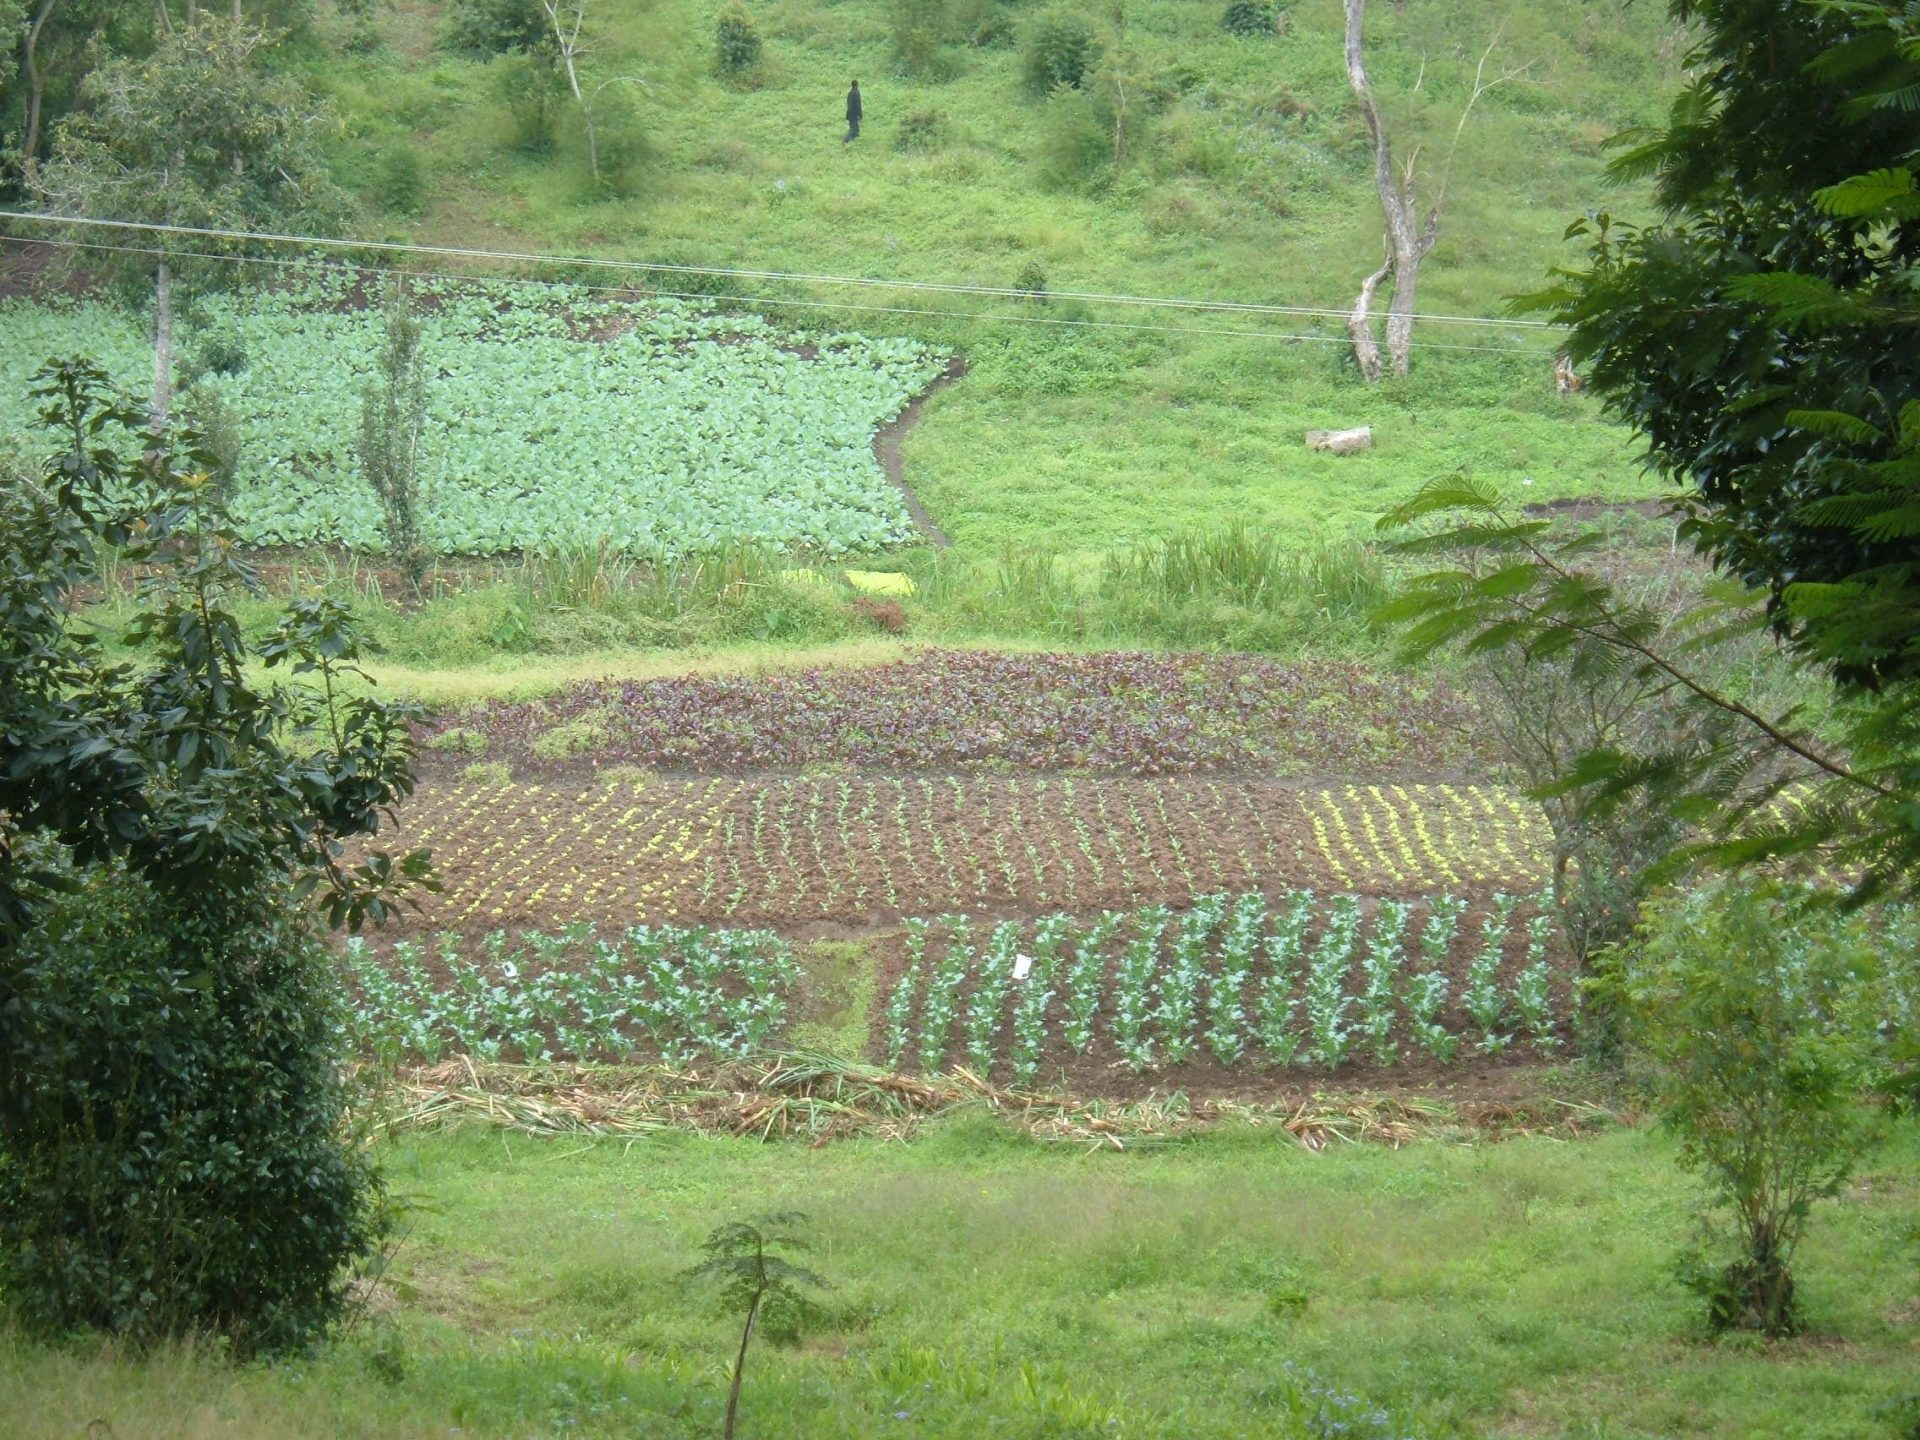 Groen gewassenveld in Tanzania